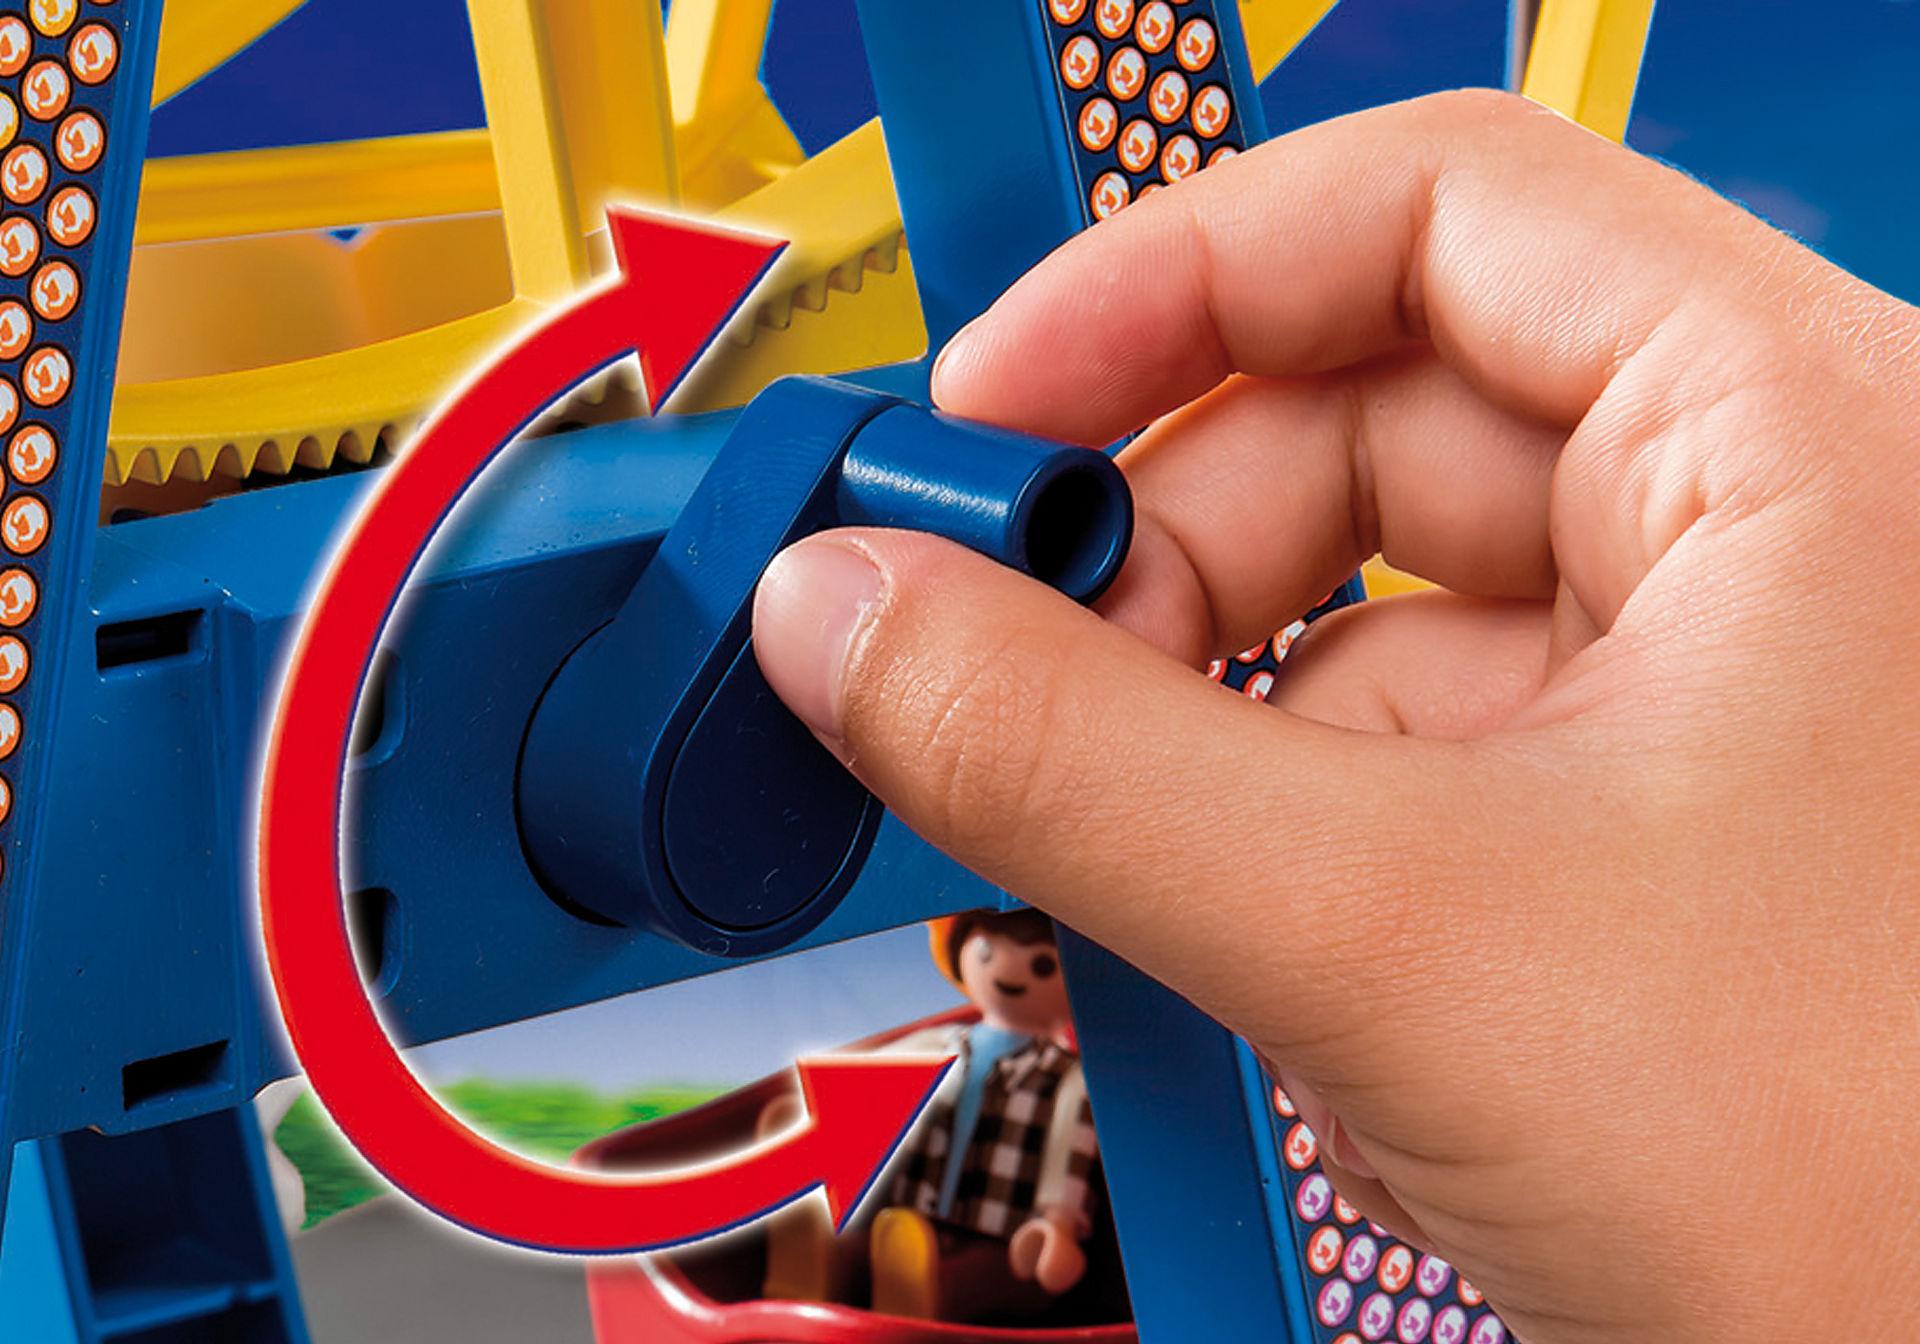 http://media.playmobil.com/i/playmobil/5552_product_extra4/Ρόδα Λούνα Παρκ με φώτα